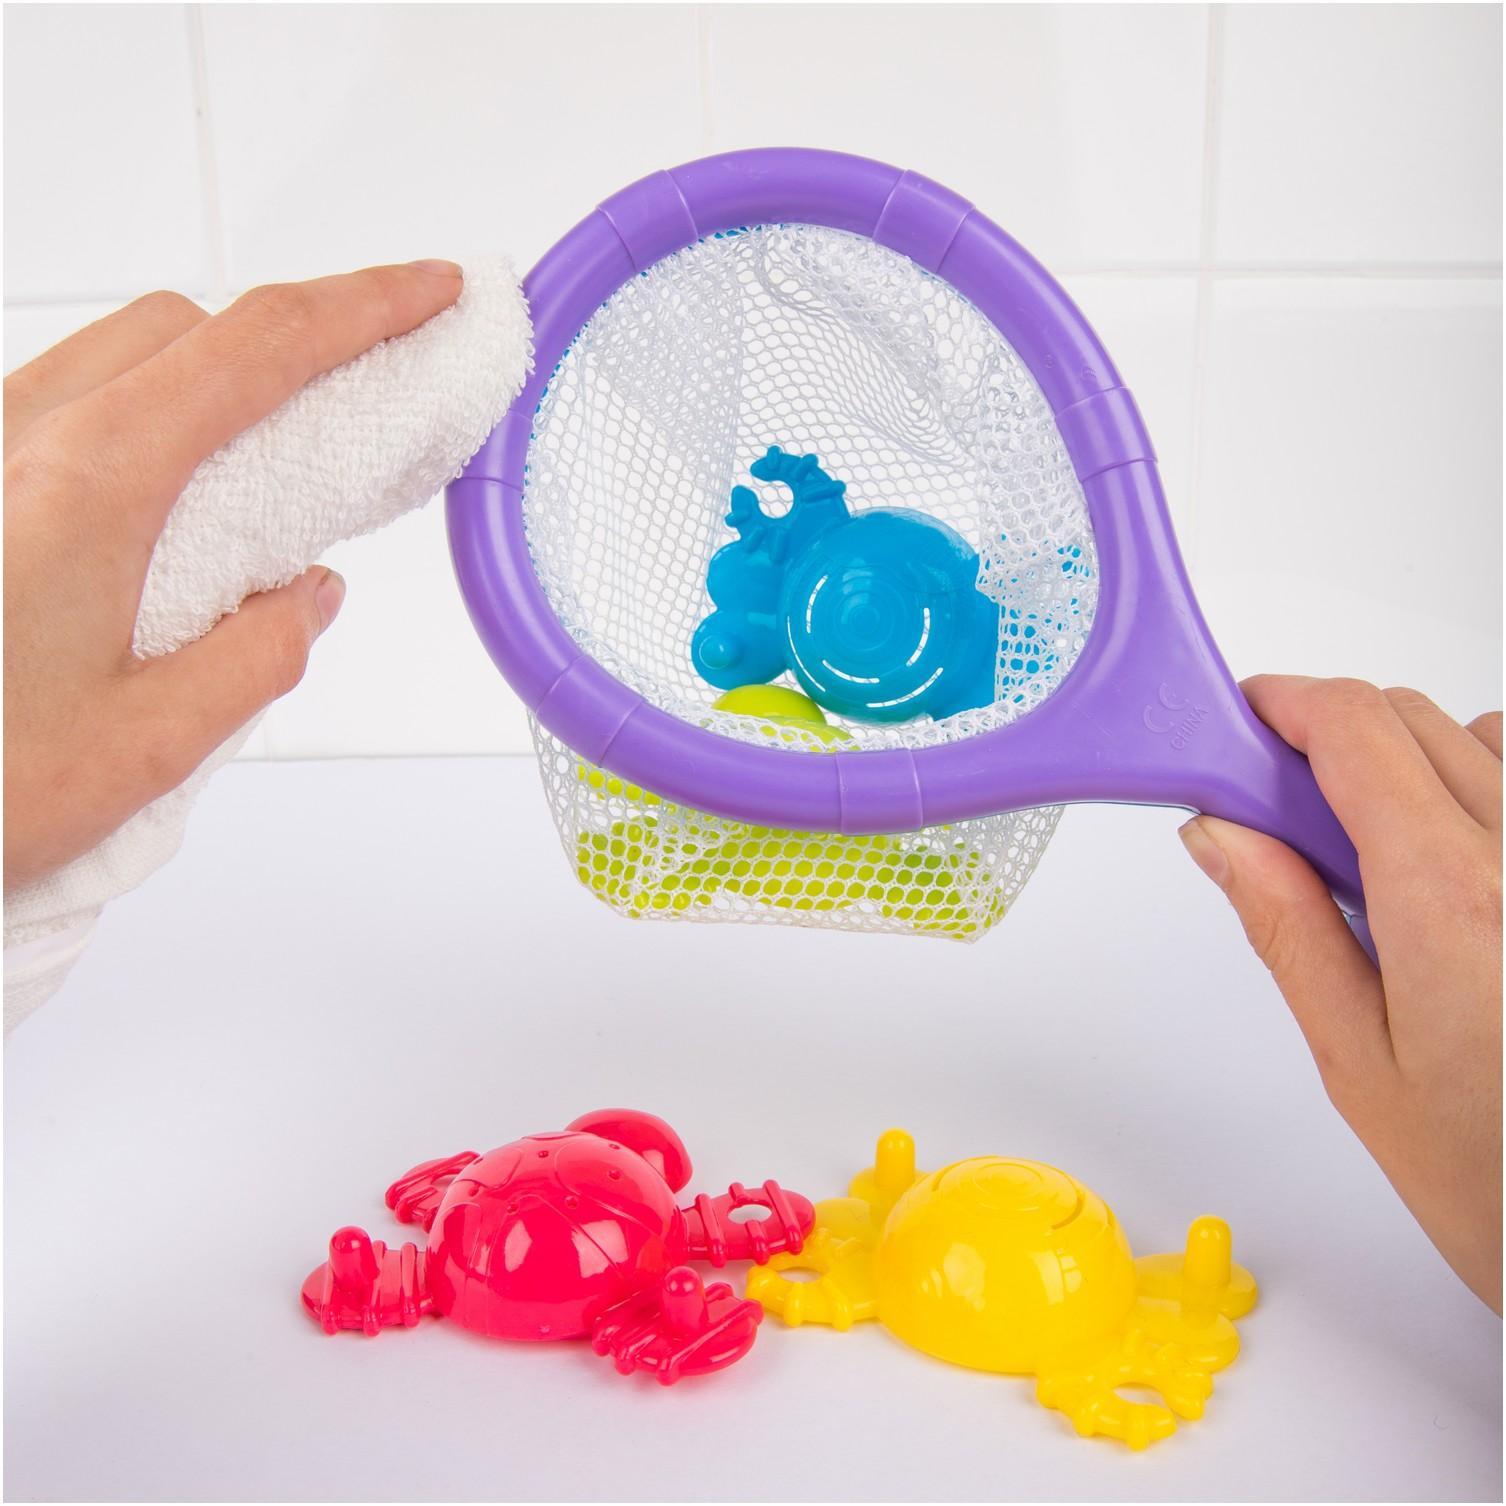 Playgro   Playgro Scoop And Splash Bath Set Multicolor